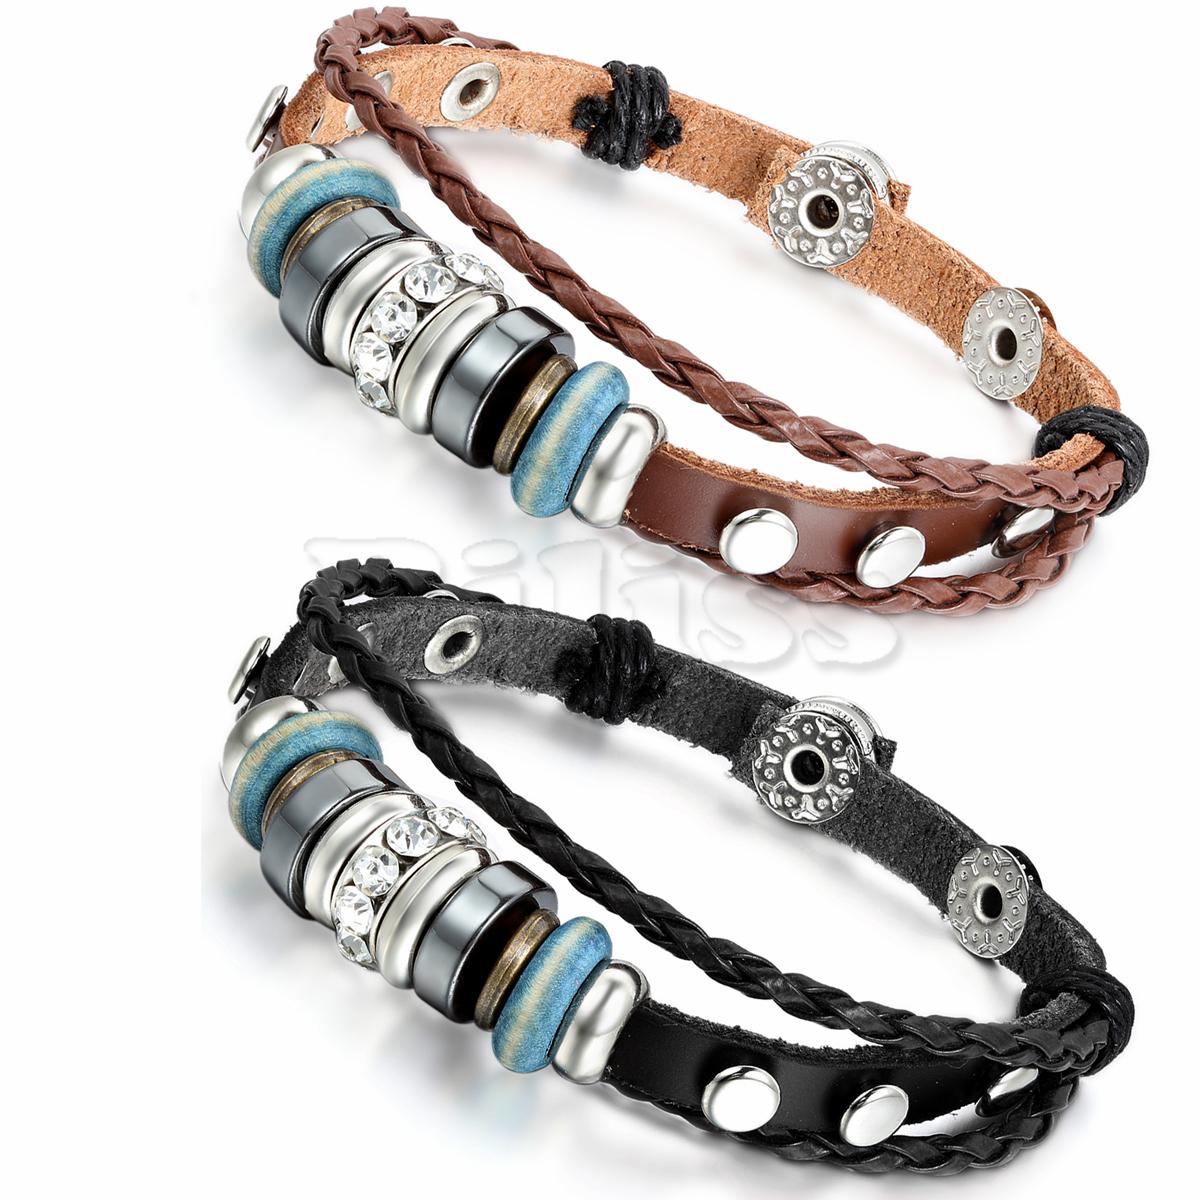 2pcs Mens Womens Leather Bracelet Surfer Wrap Bangle Charm Beads Braided Multilayer Bracelet Black Brown pulseira masculina(China (Mainland))